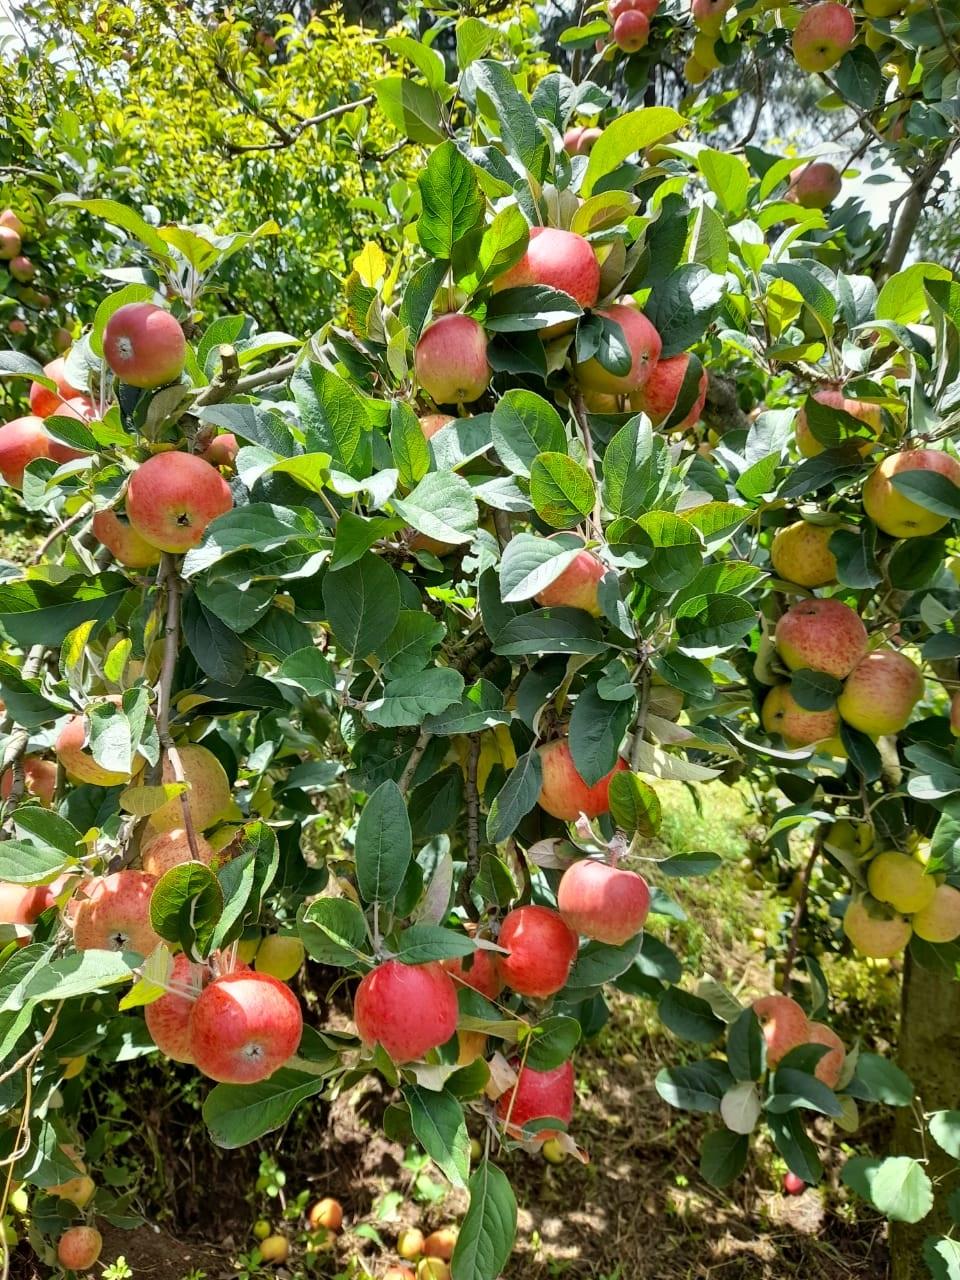 Abundant apples in Guatemala 🍎🍎🍎